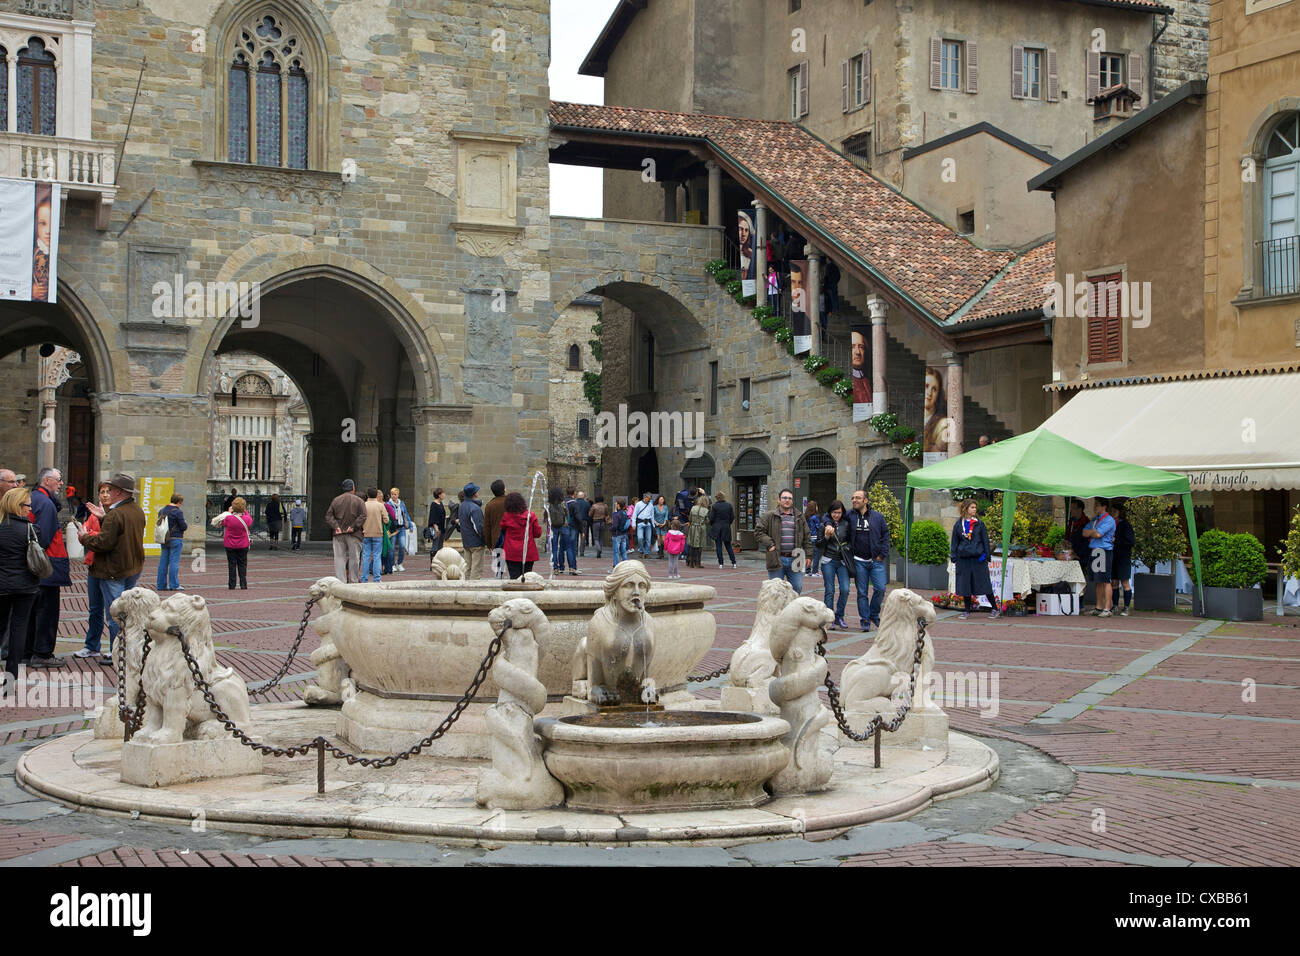 Contarini fountain, 1780, Piazza Vecchia, upper city, Bergamo, Lombardy, Italy, Europe Stock Photo